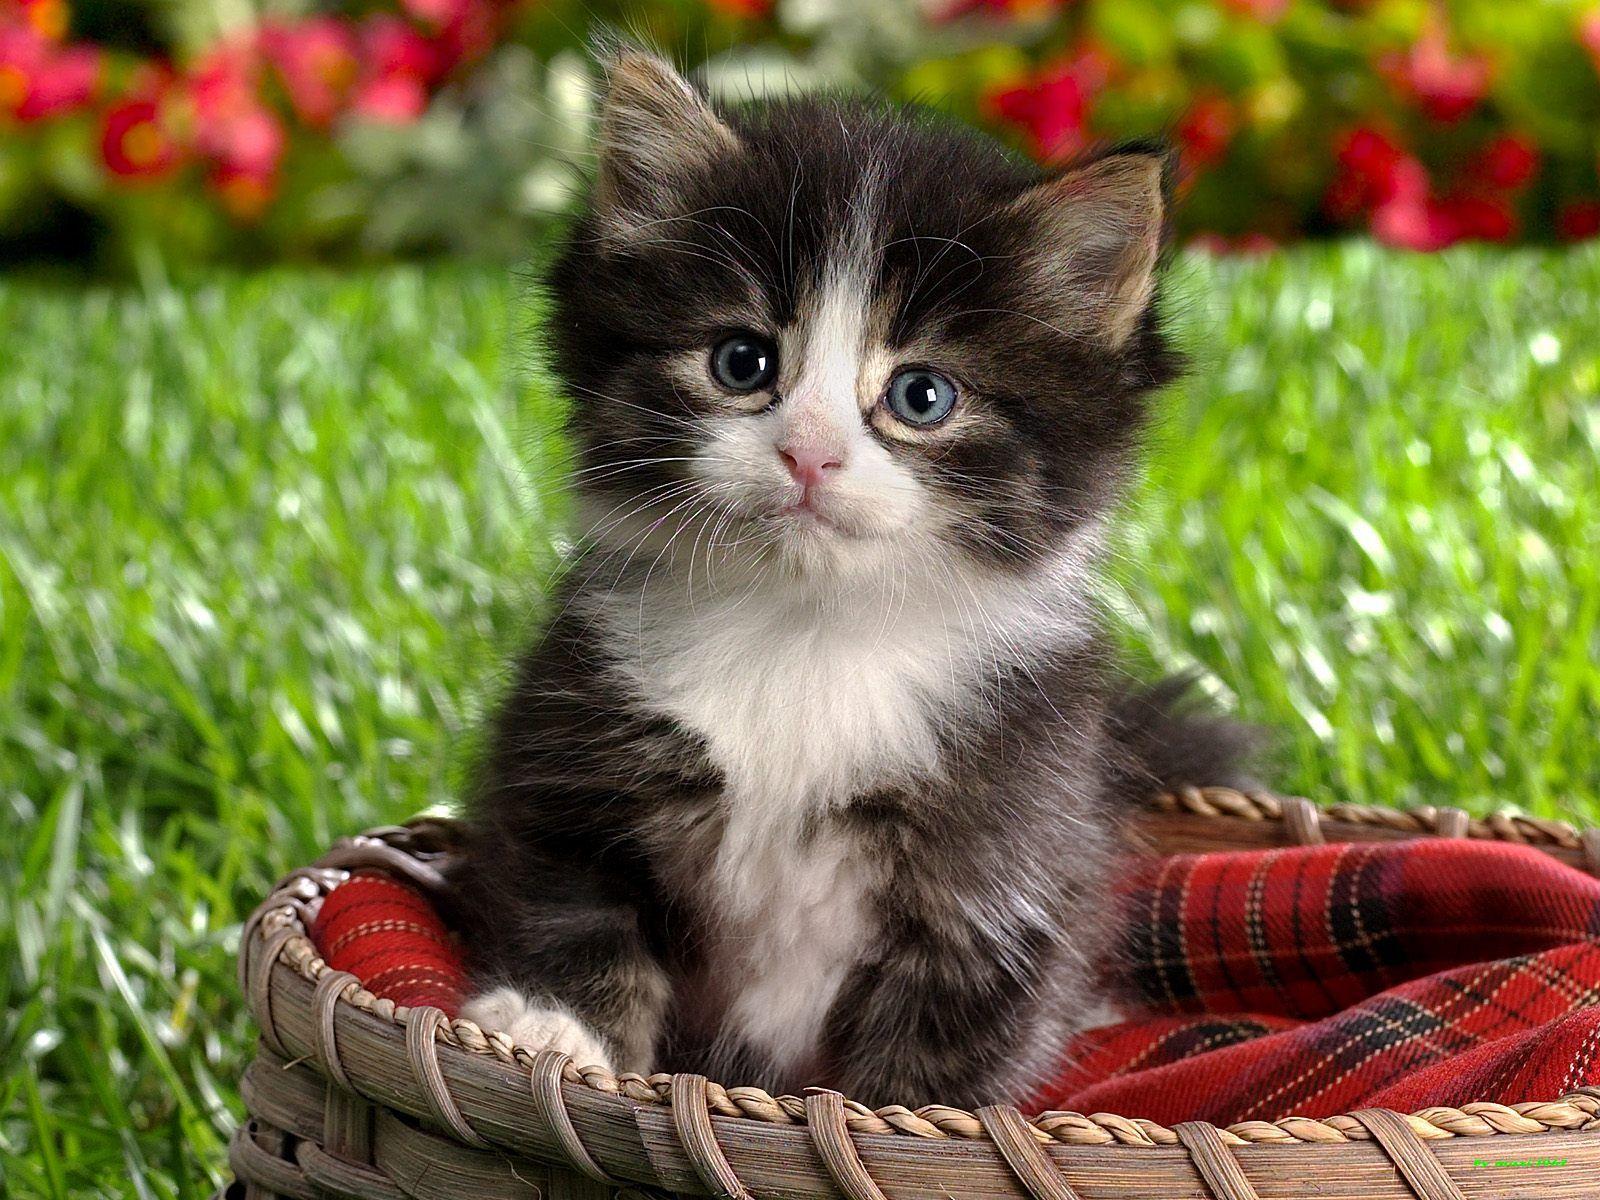 Schone Katzenbilder Wallpapers Fur Team Ulm Die 13 Te Schone Katzenbilder Katzen Baby Katzen Katzenbabys